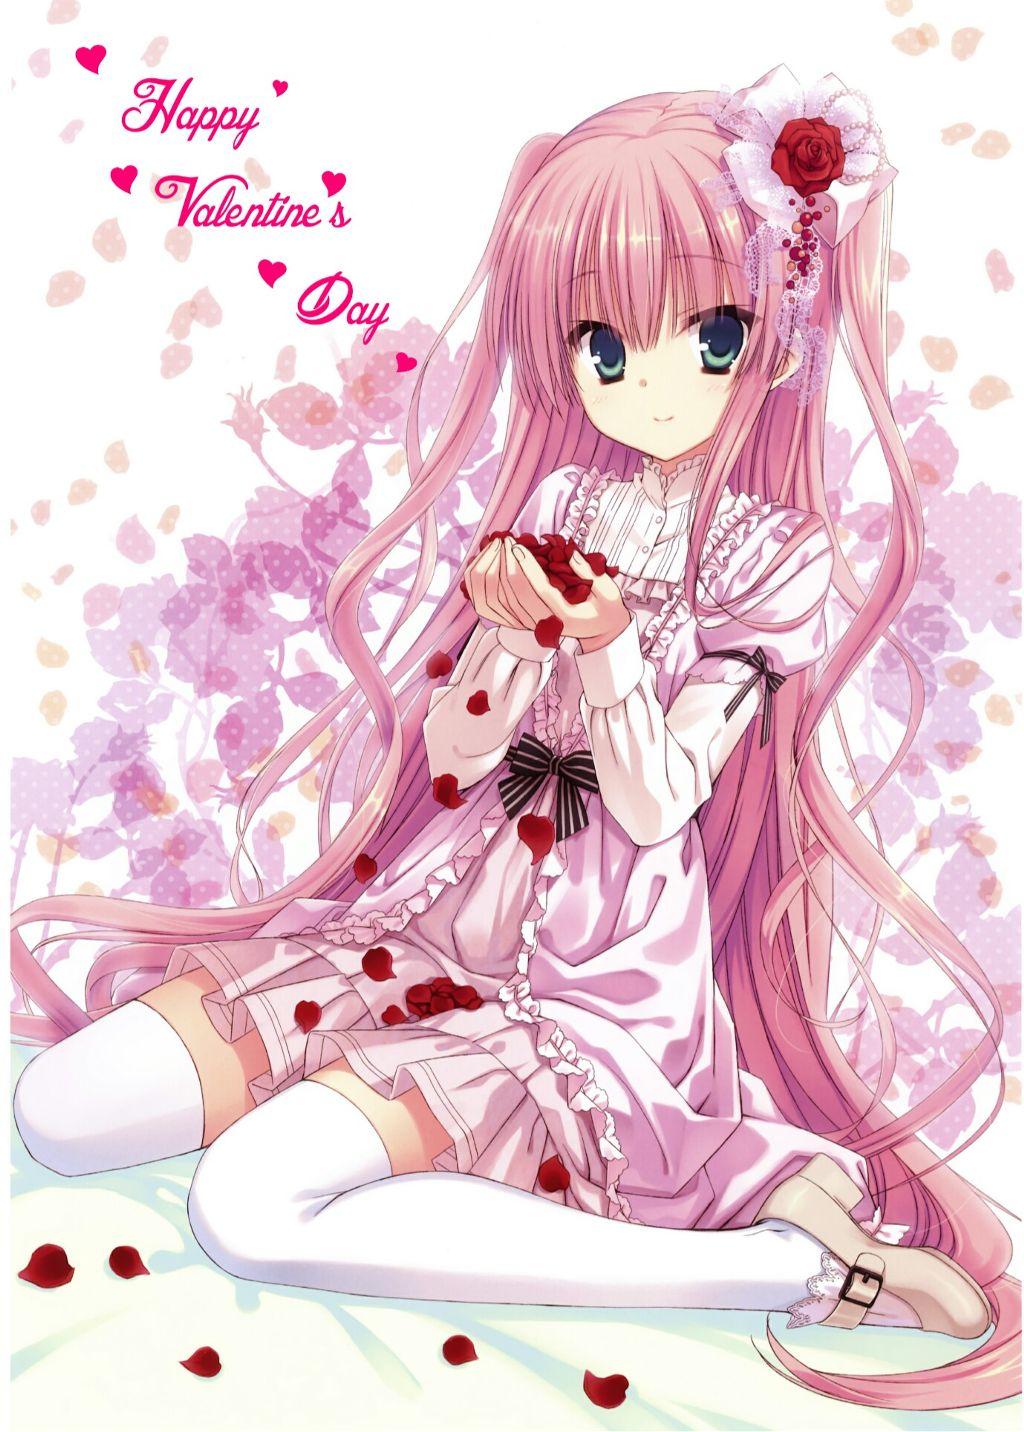 Freetoedit Anime Girl Kawaii Cute Pink Emotions Happyv